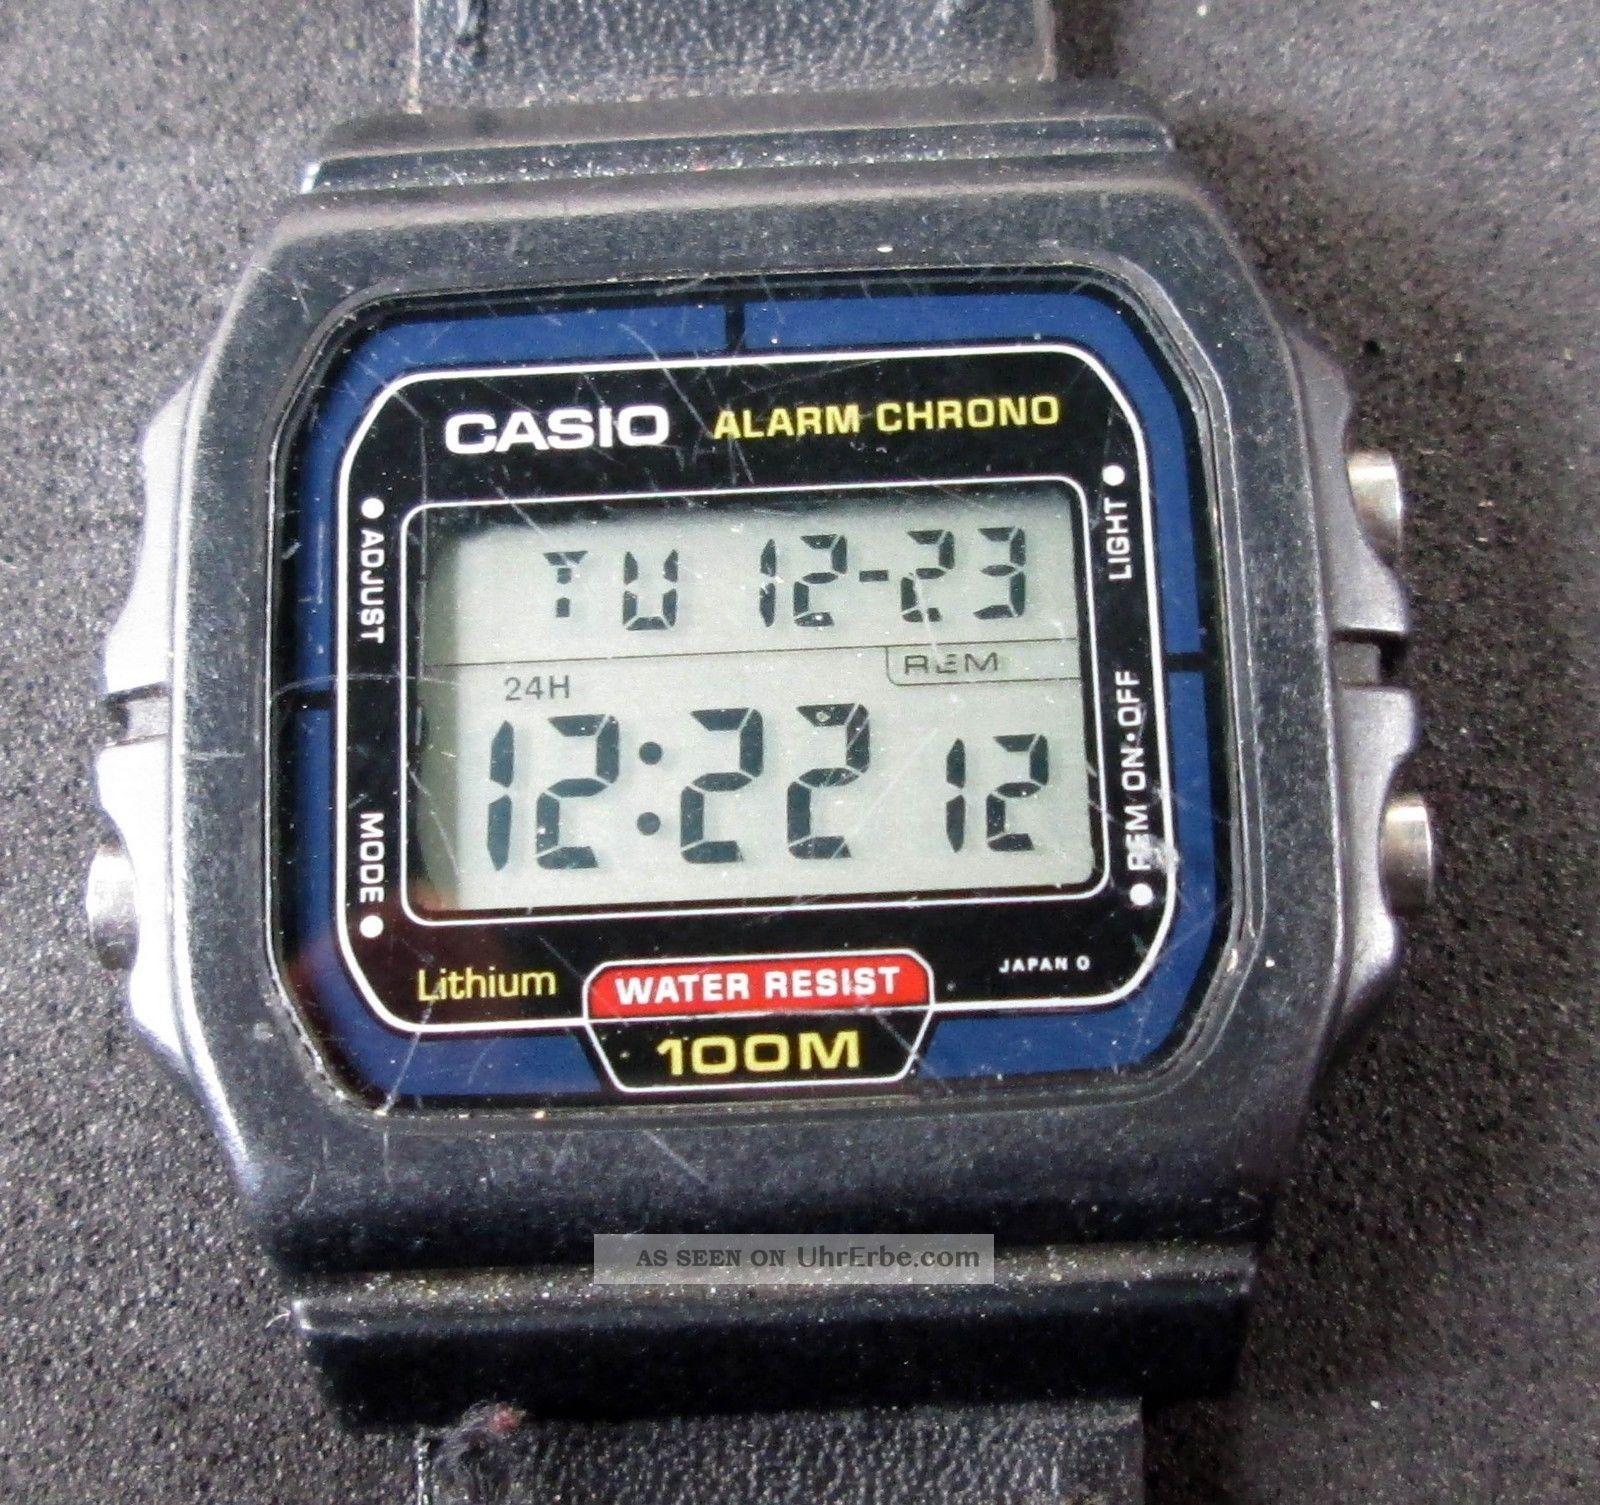 Casio Alarm Chronograph,  Herrenarmbanduhr,  Digitalanzeige,  Uhr Läuft, Armbanduhren Bild